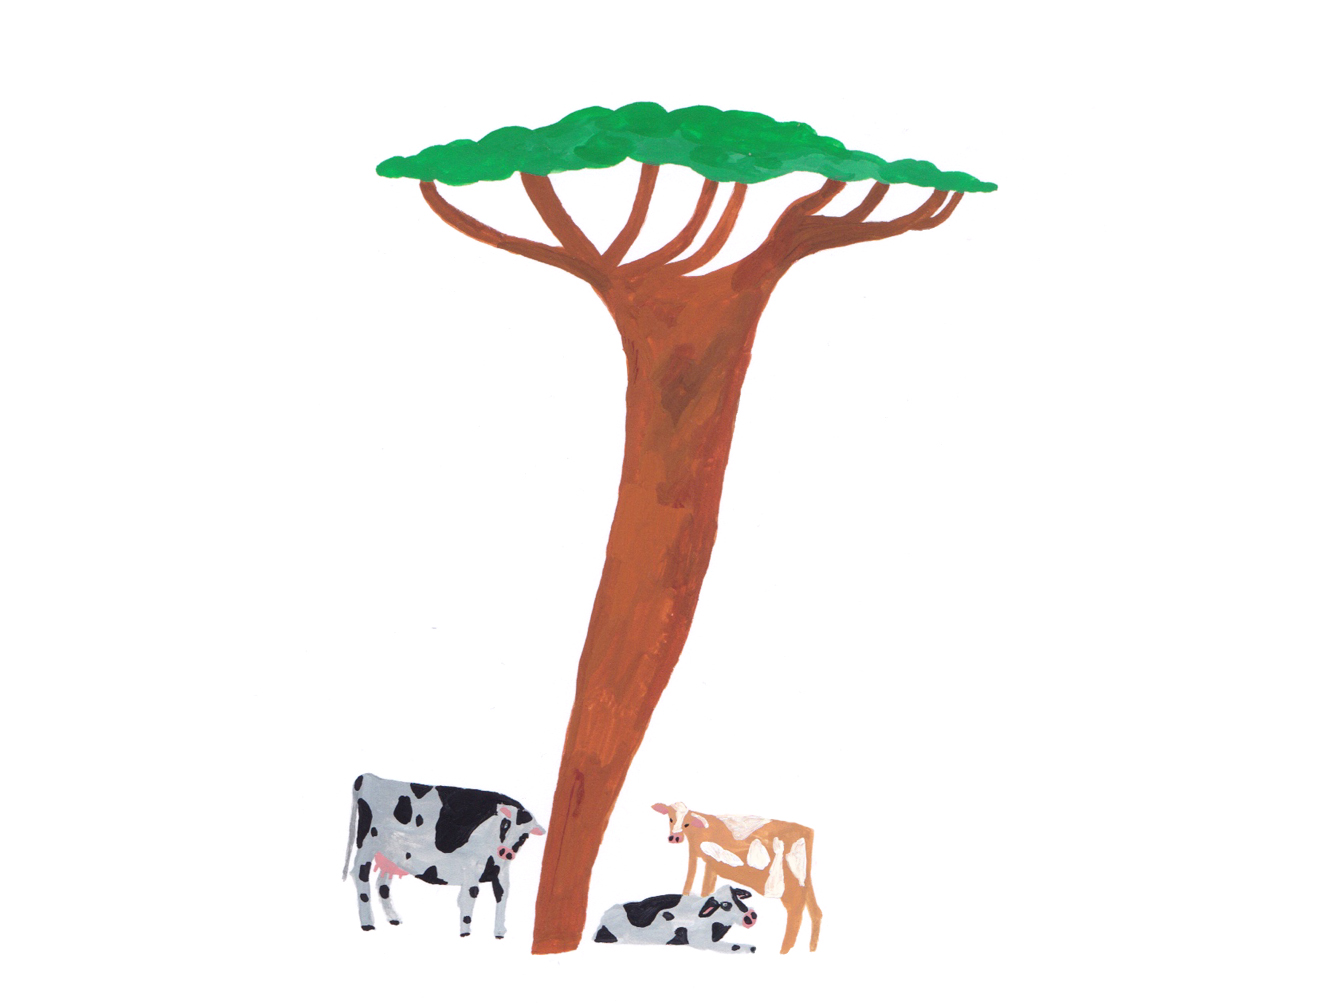 Copy of Silvopasture tree and cows.jpg